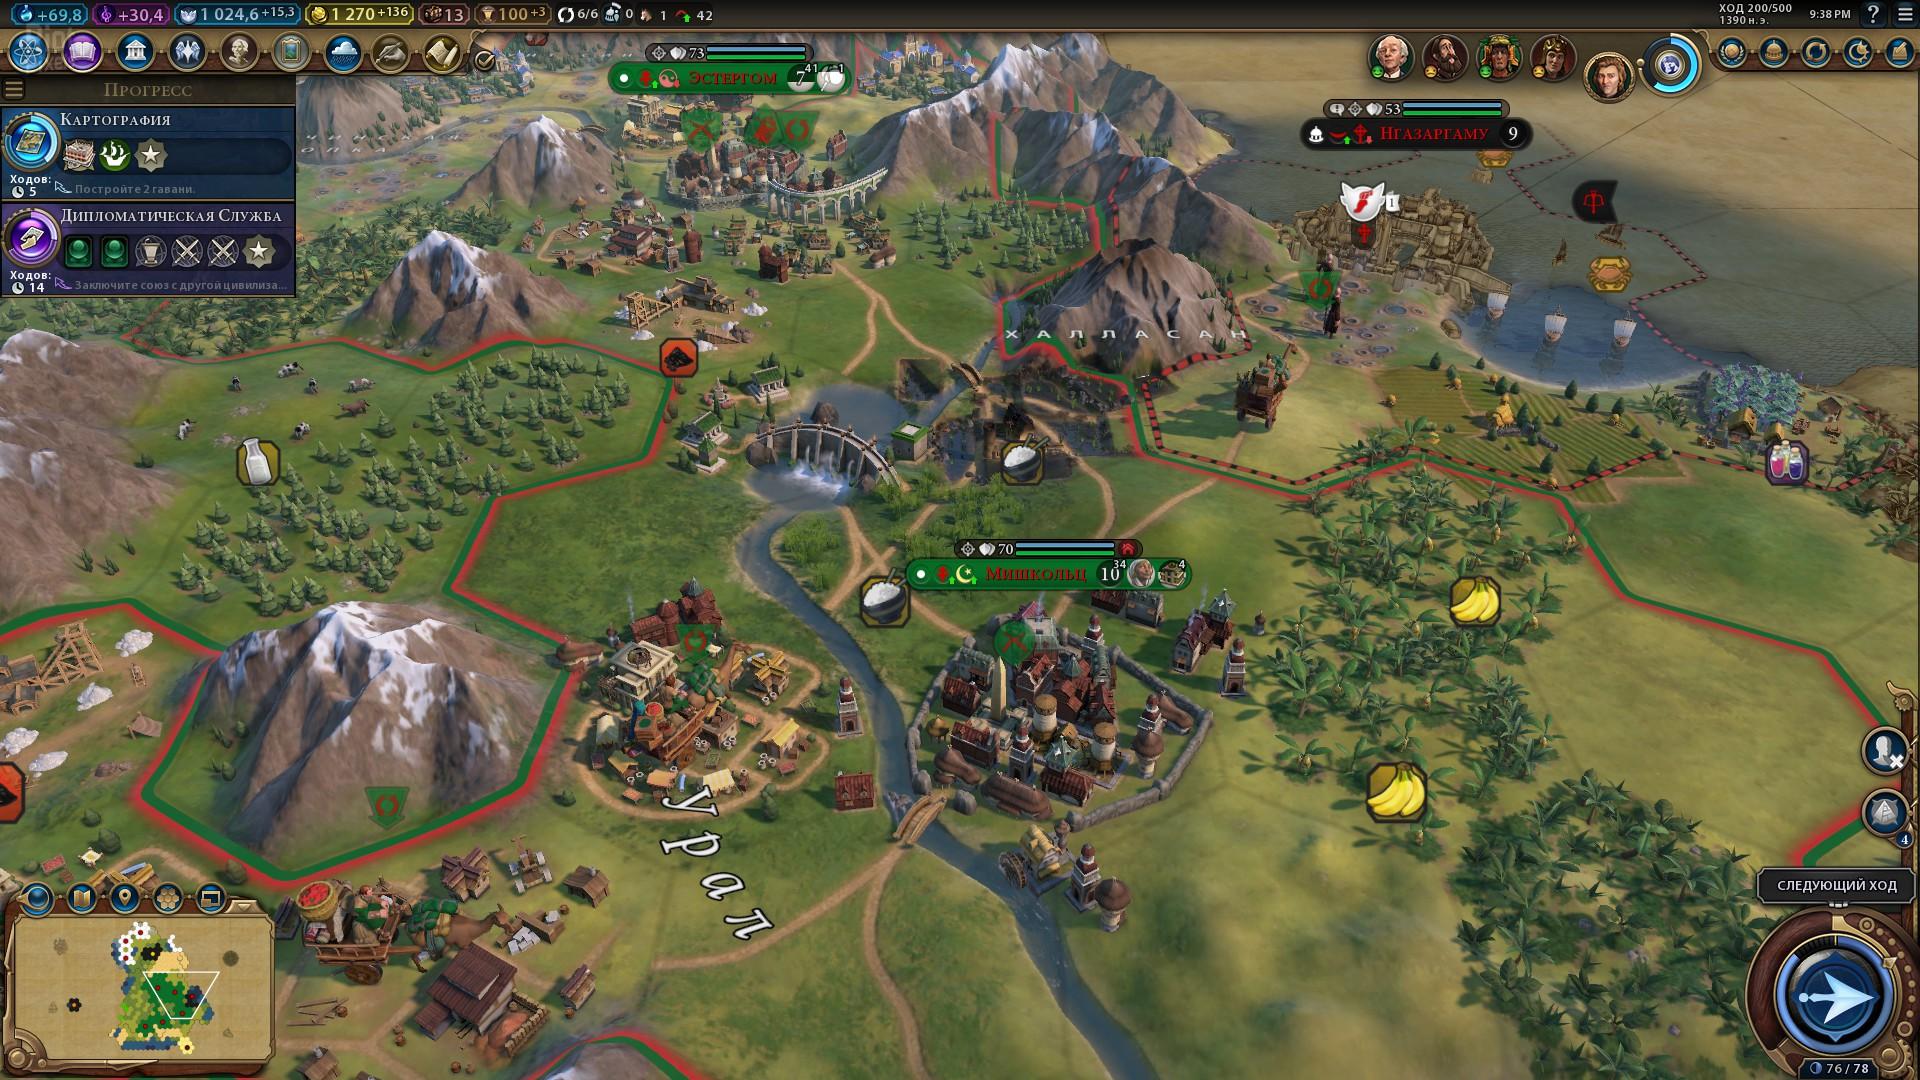 Sid Meier's Civilization 6: Gathering Storm - скриншоты из игры на